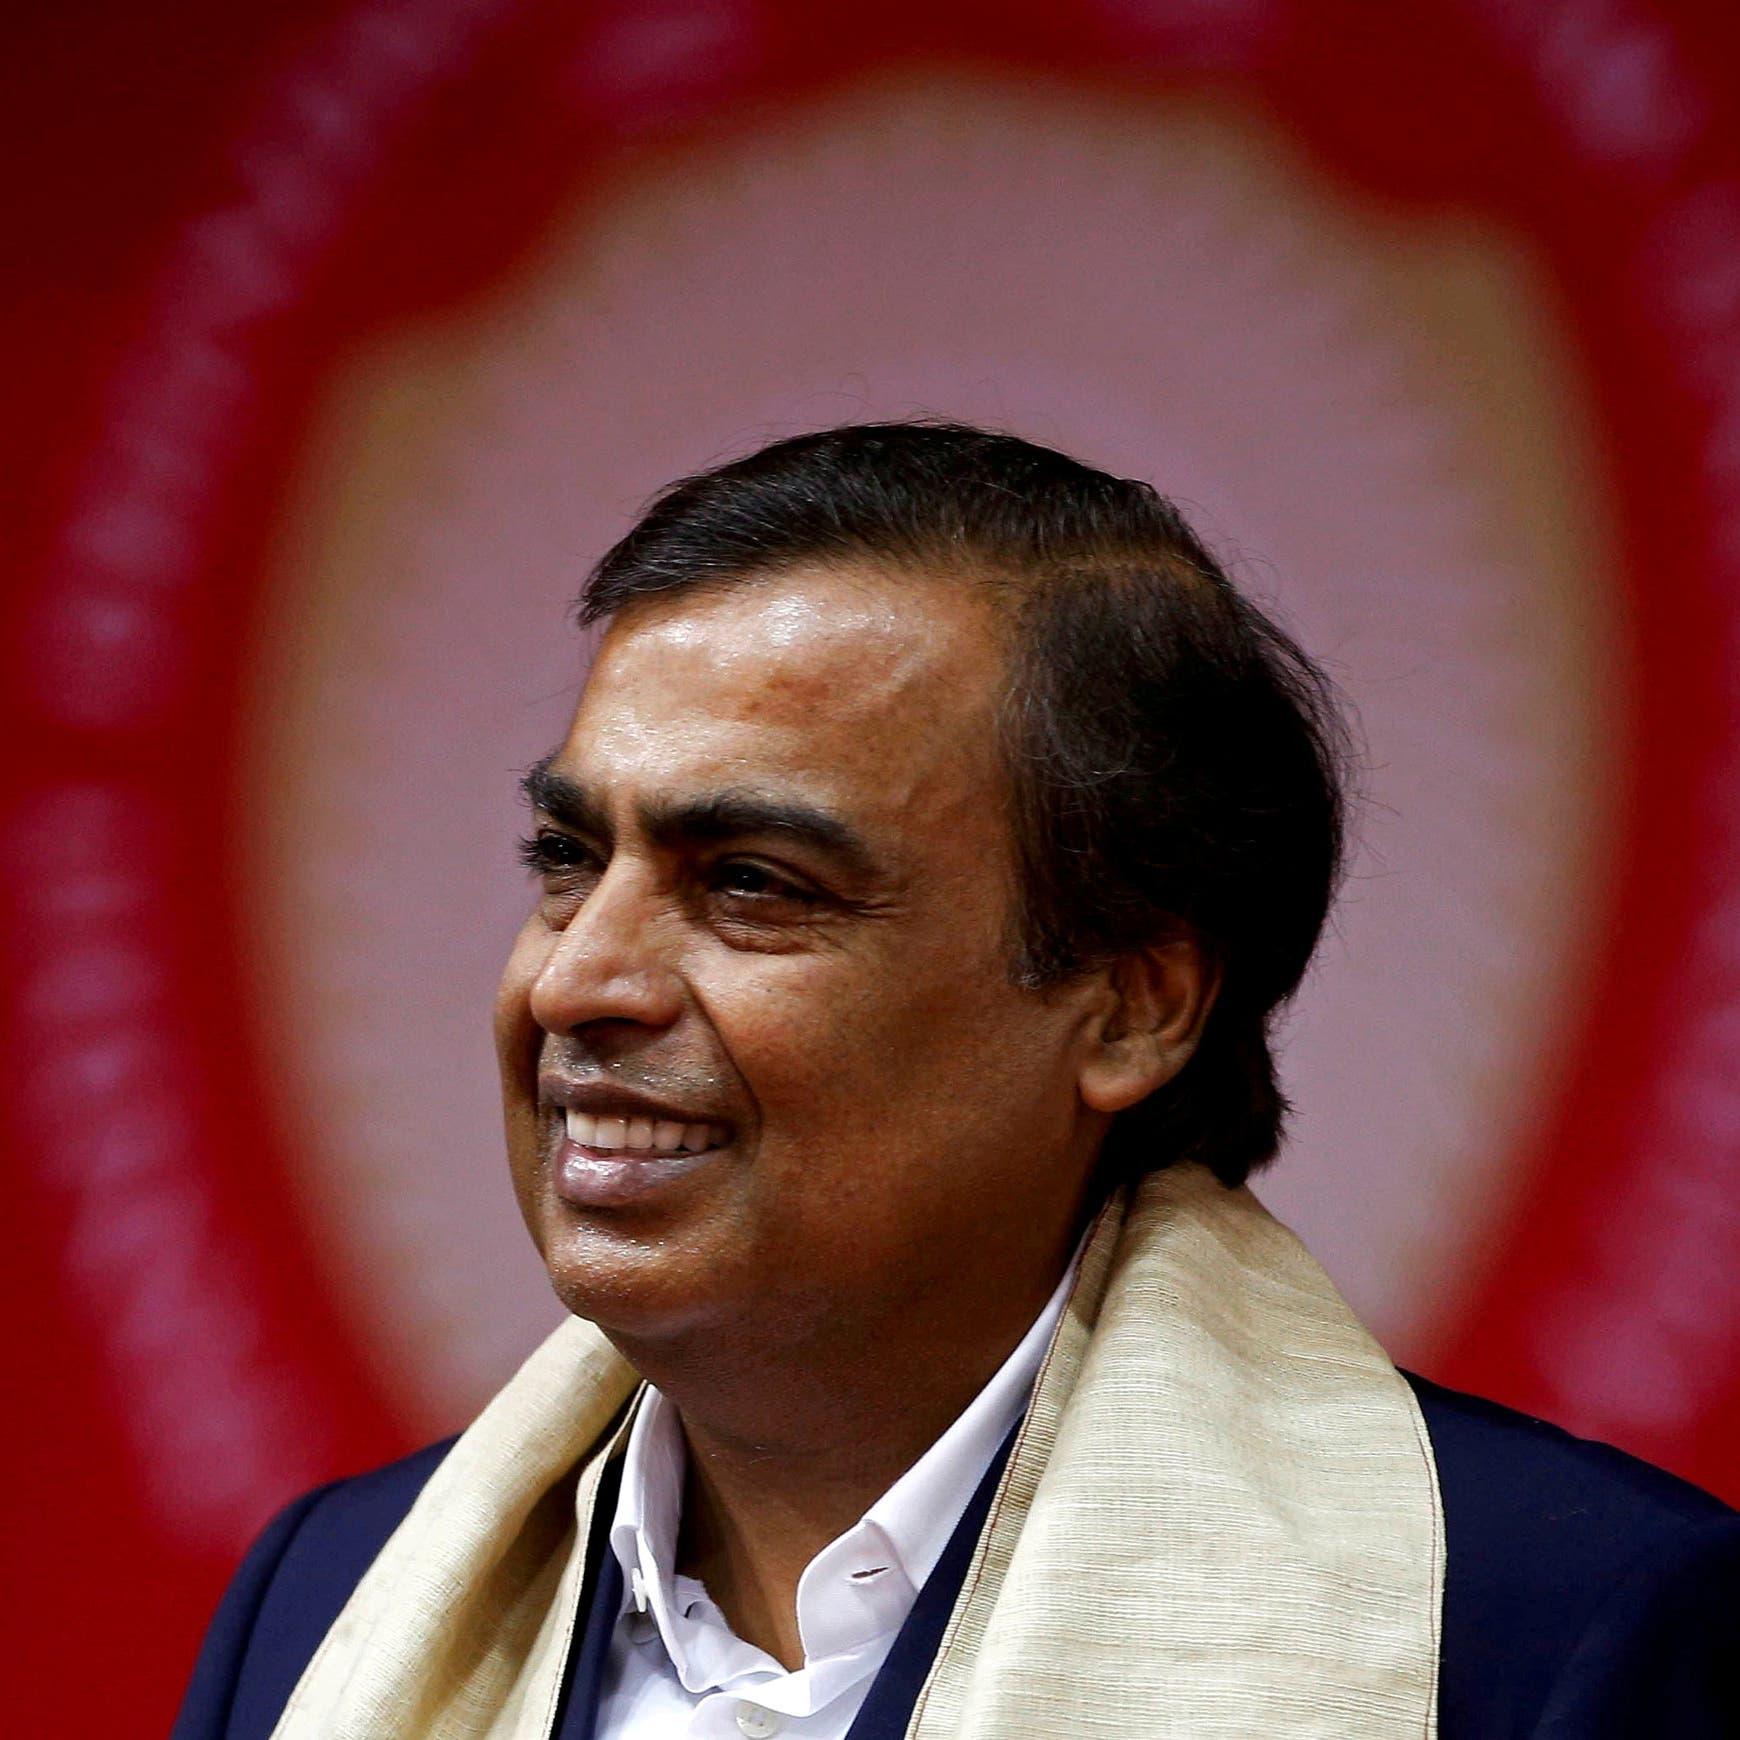 India's richest man Mukesh Ambani earns $3.7 billion in one day